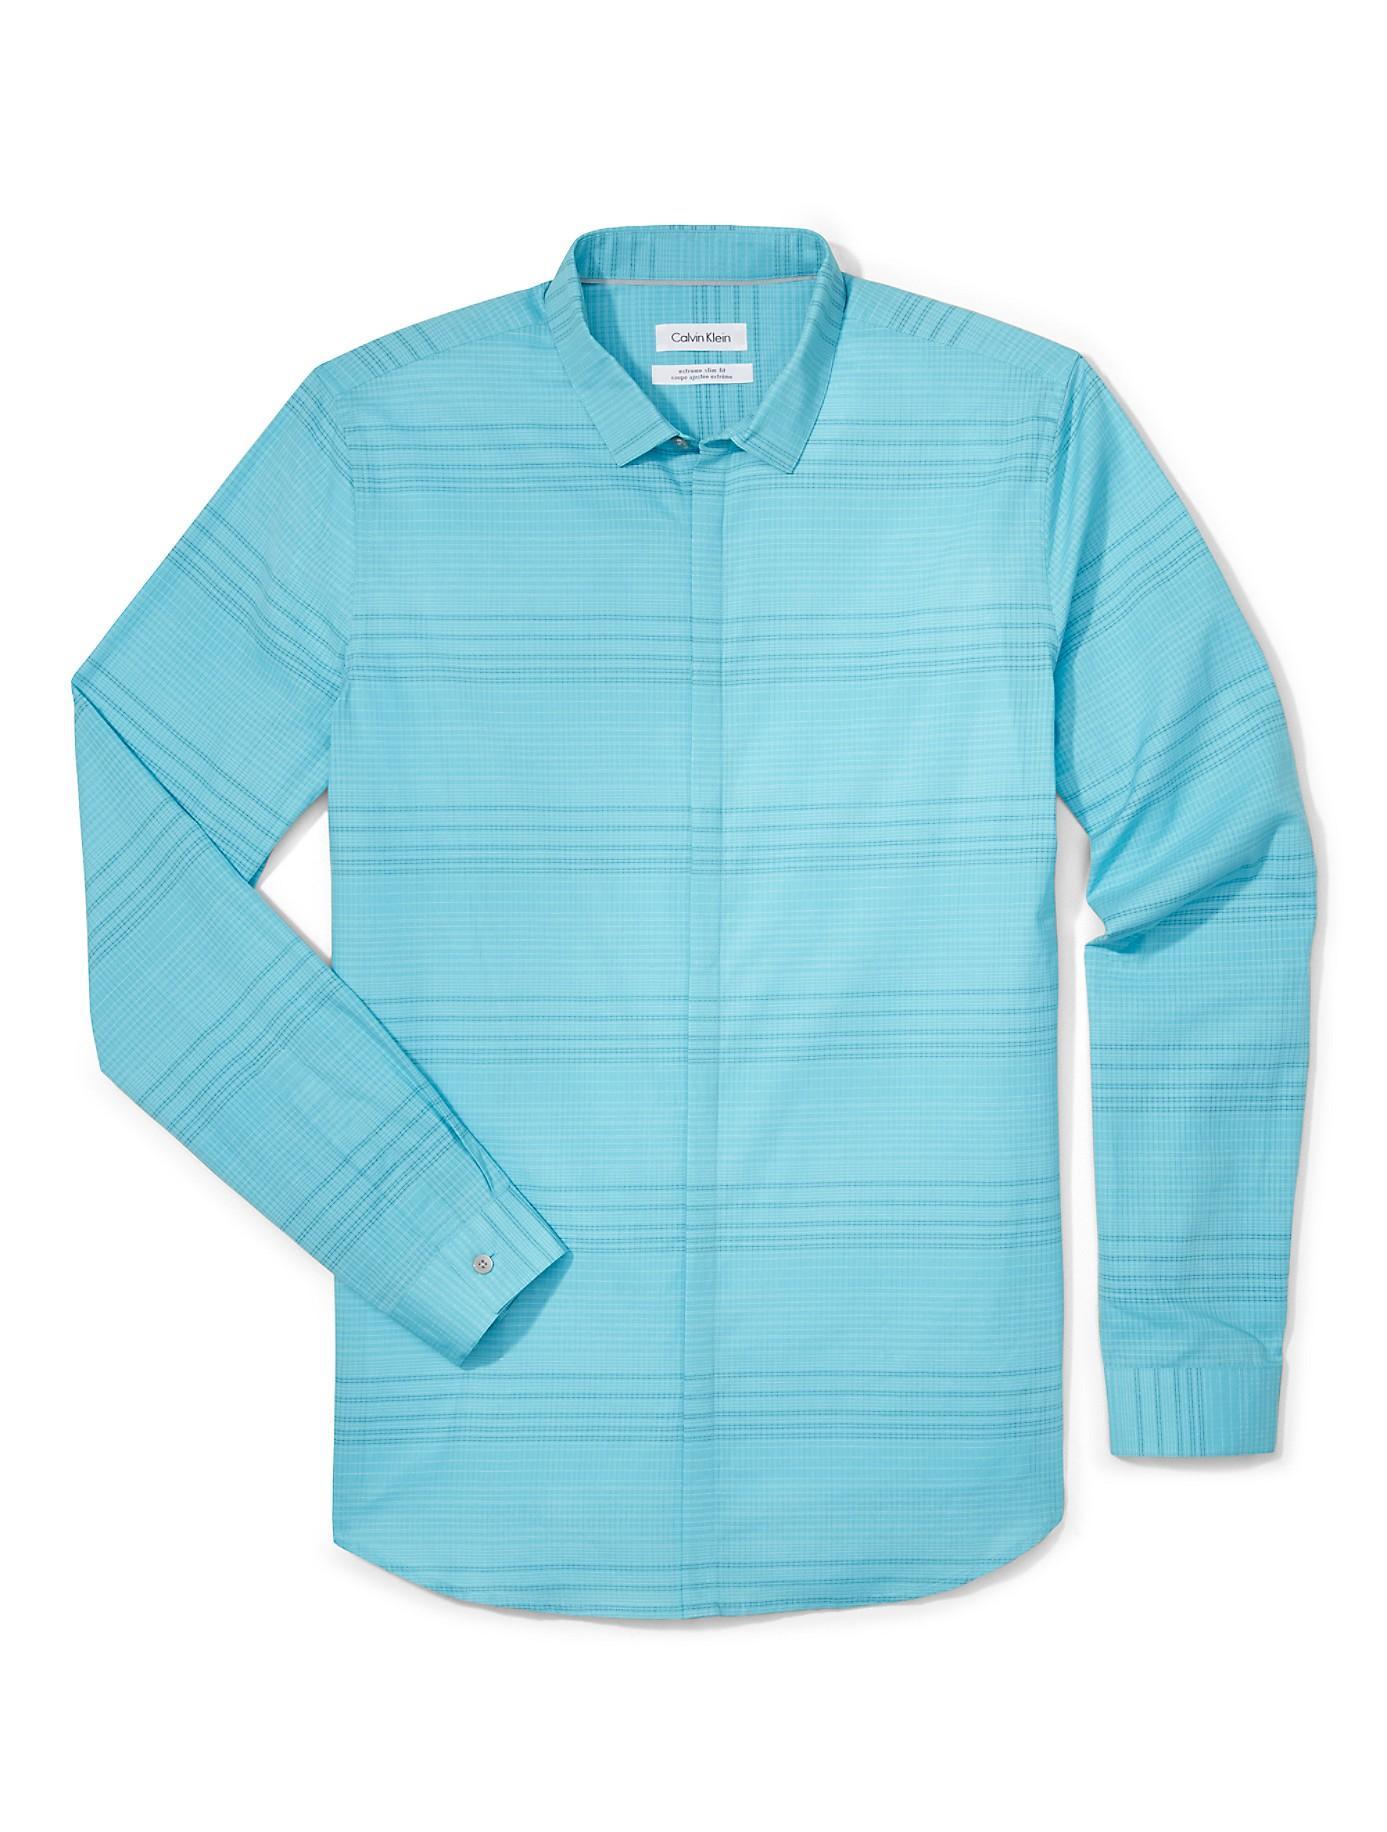 Calvin klein white label x fit ultra slim fit horizontal for Calvin klein x fit dress shirt